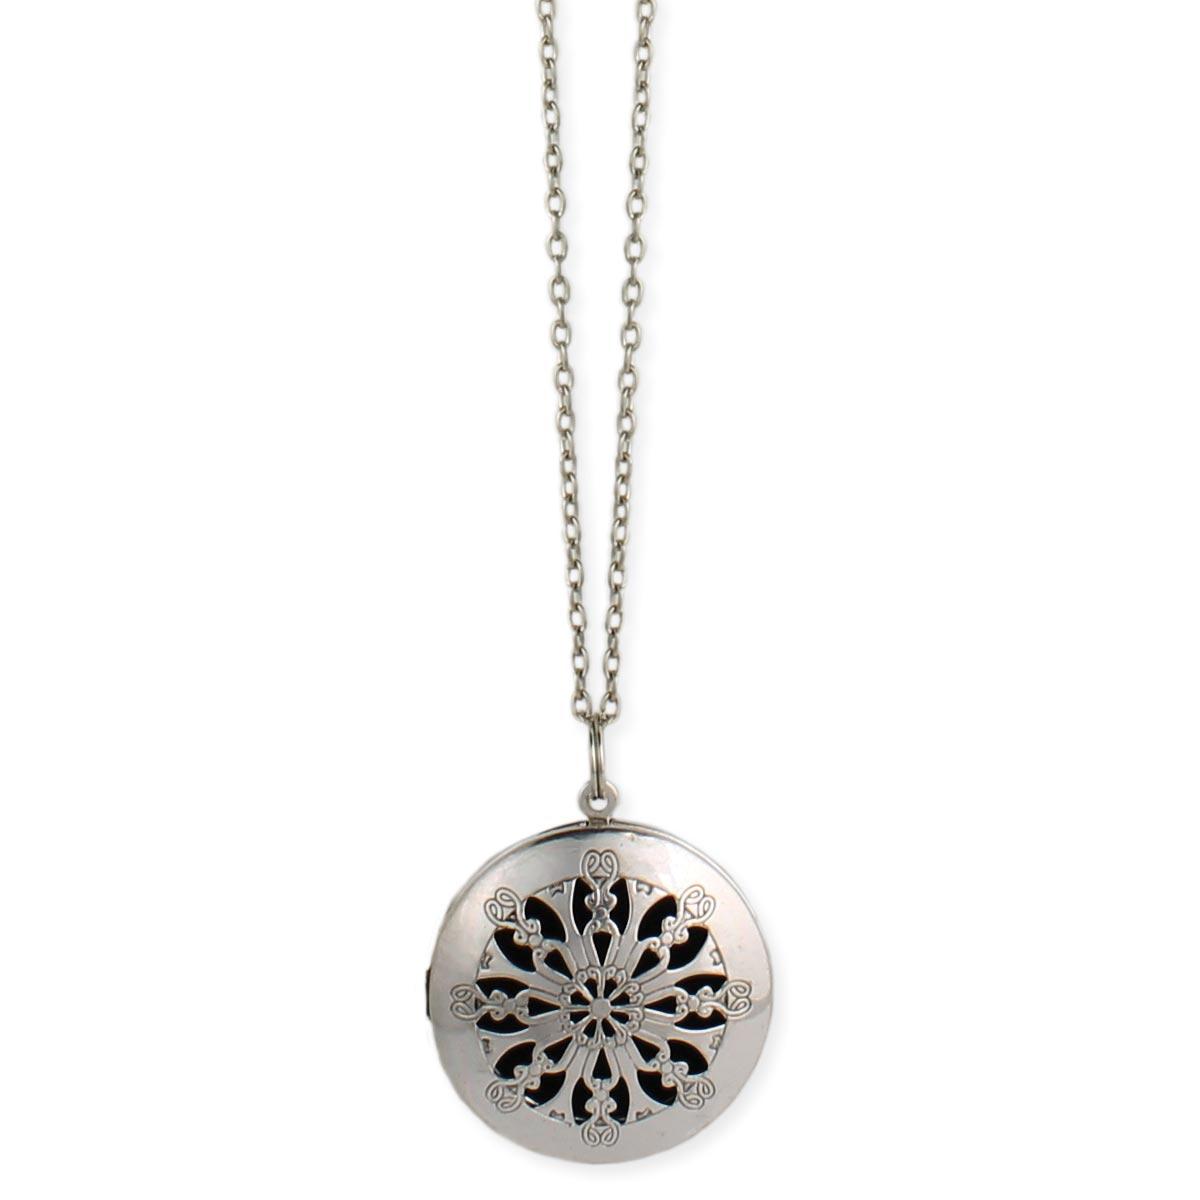 Wholesale silver cutout diffuser locket long necklace zad fashion silver cutout essential oil diffuser locket long necklace aloadofball Choice Image